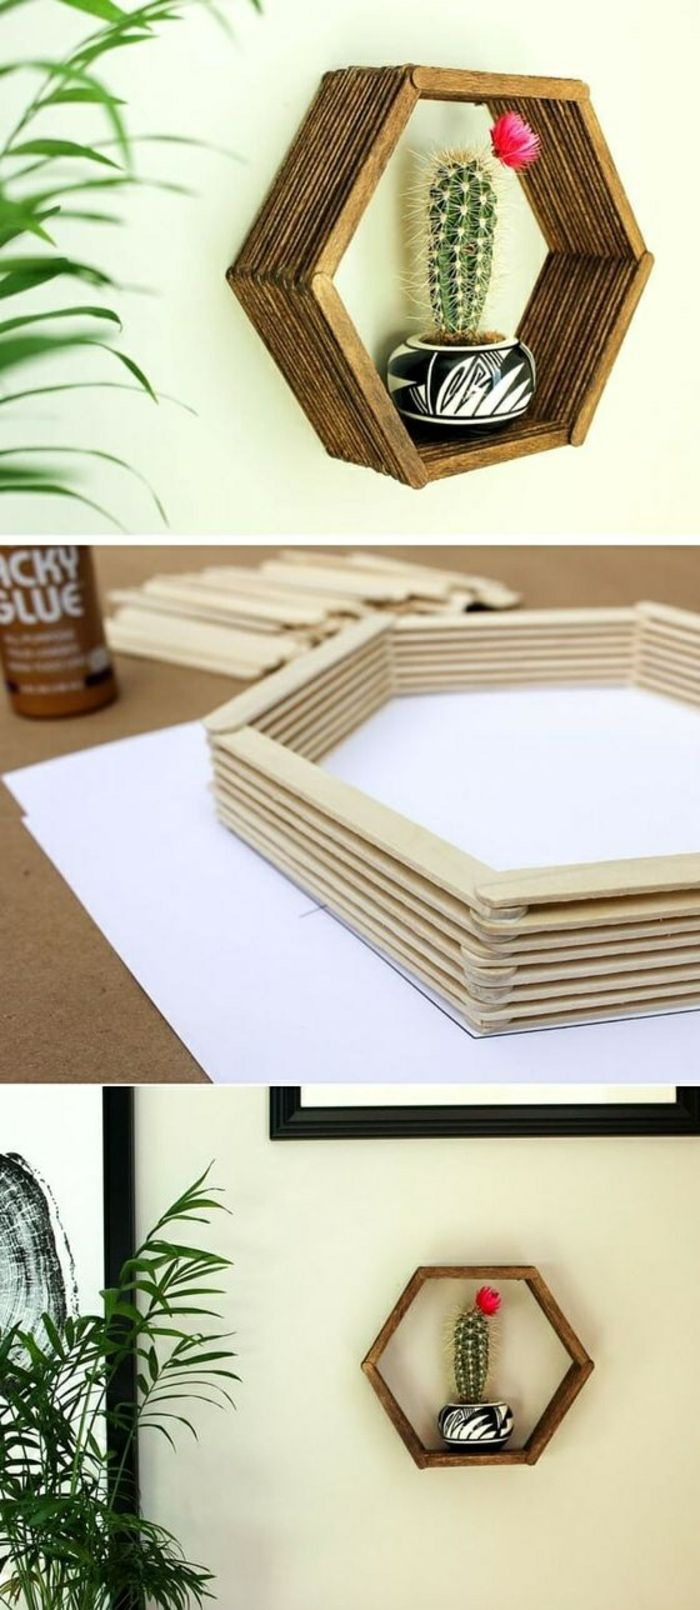 7 küchenregal selber machen aus karton blumentopf pflanze diy projekt blume